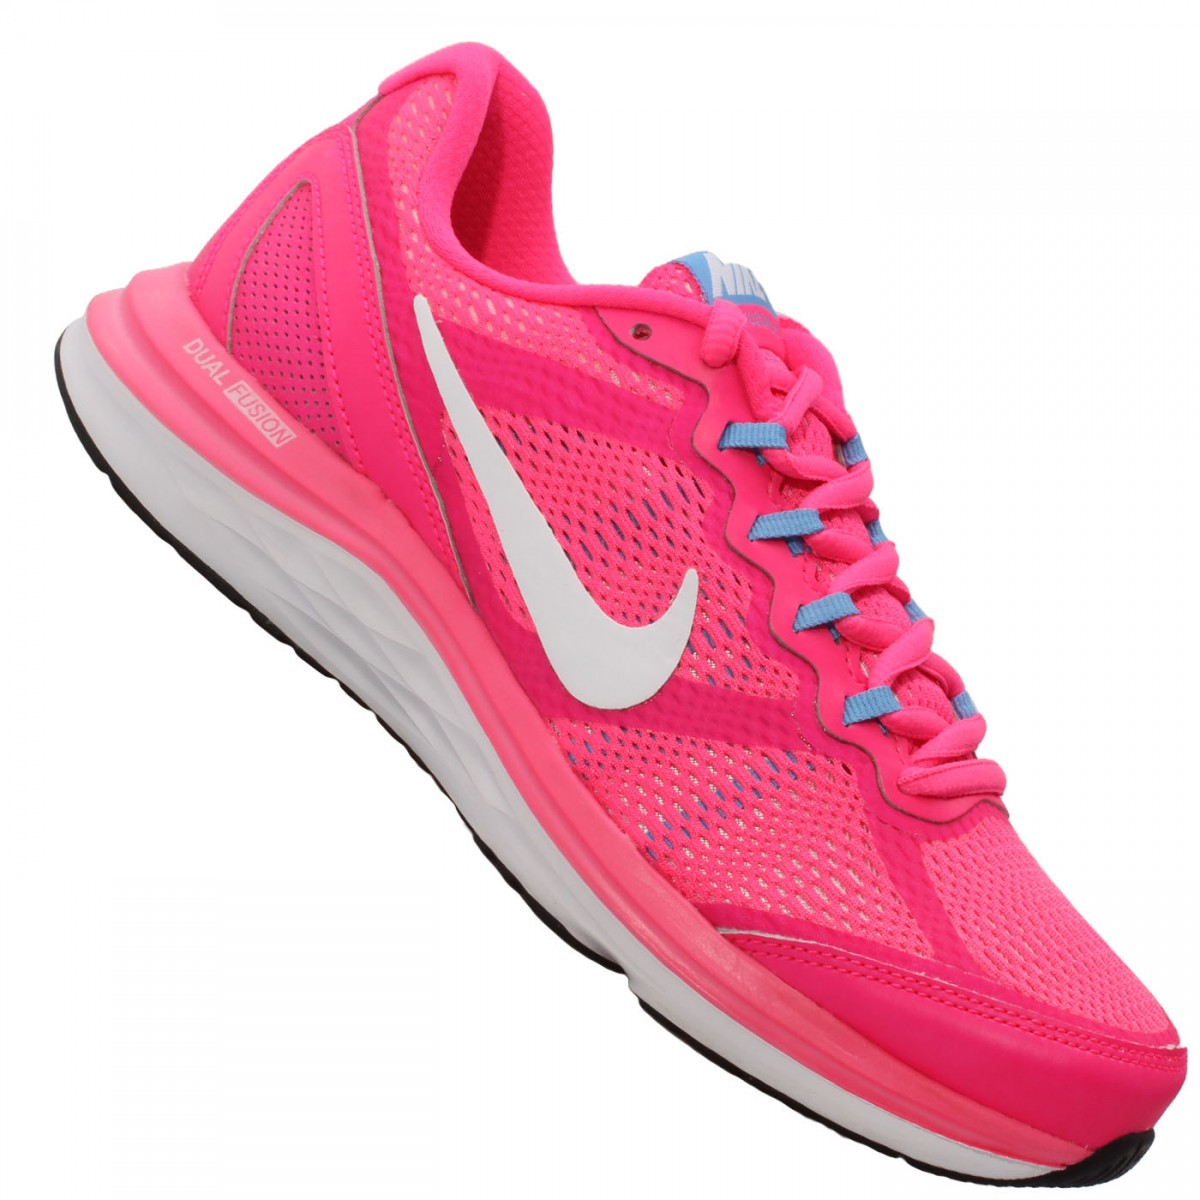 8b95ba46965 ... Tênis Nike Dual Fusion Run 3 - Feminino ...